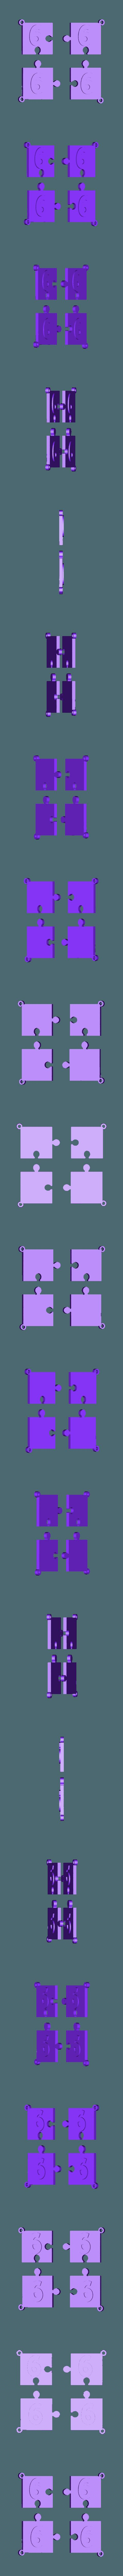 puzzle 6.stl Download STL file puzzle key ring • 3D printing design, catf3d